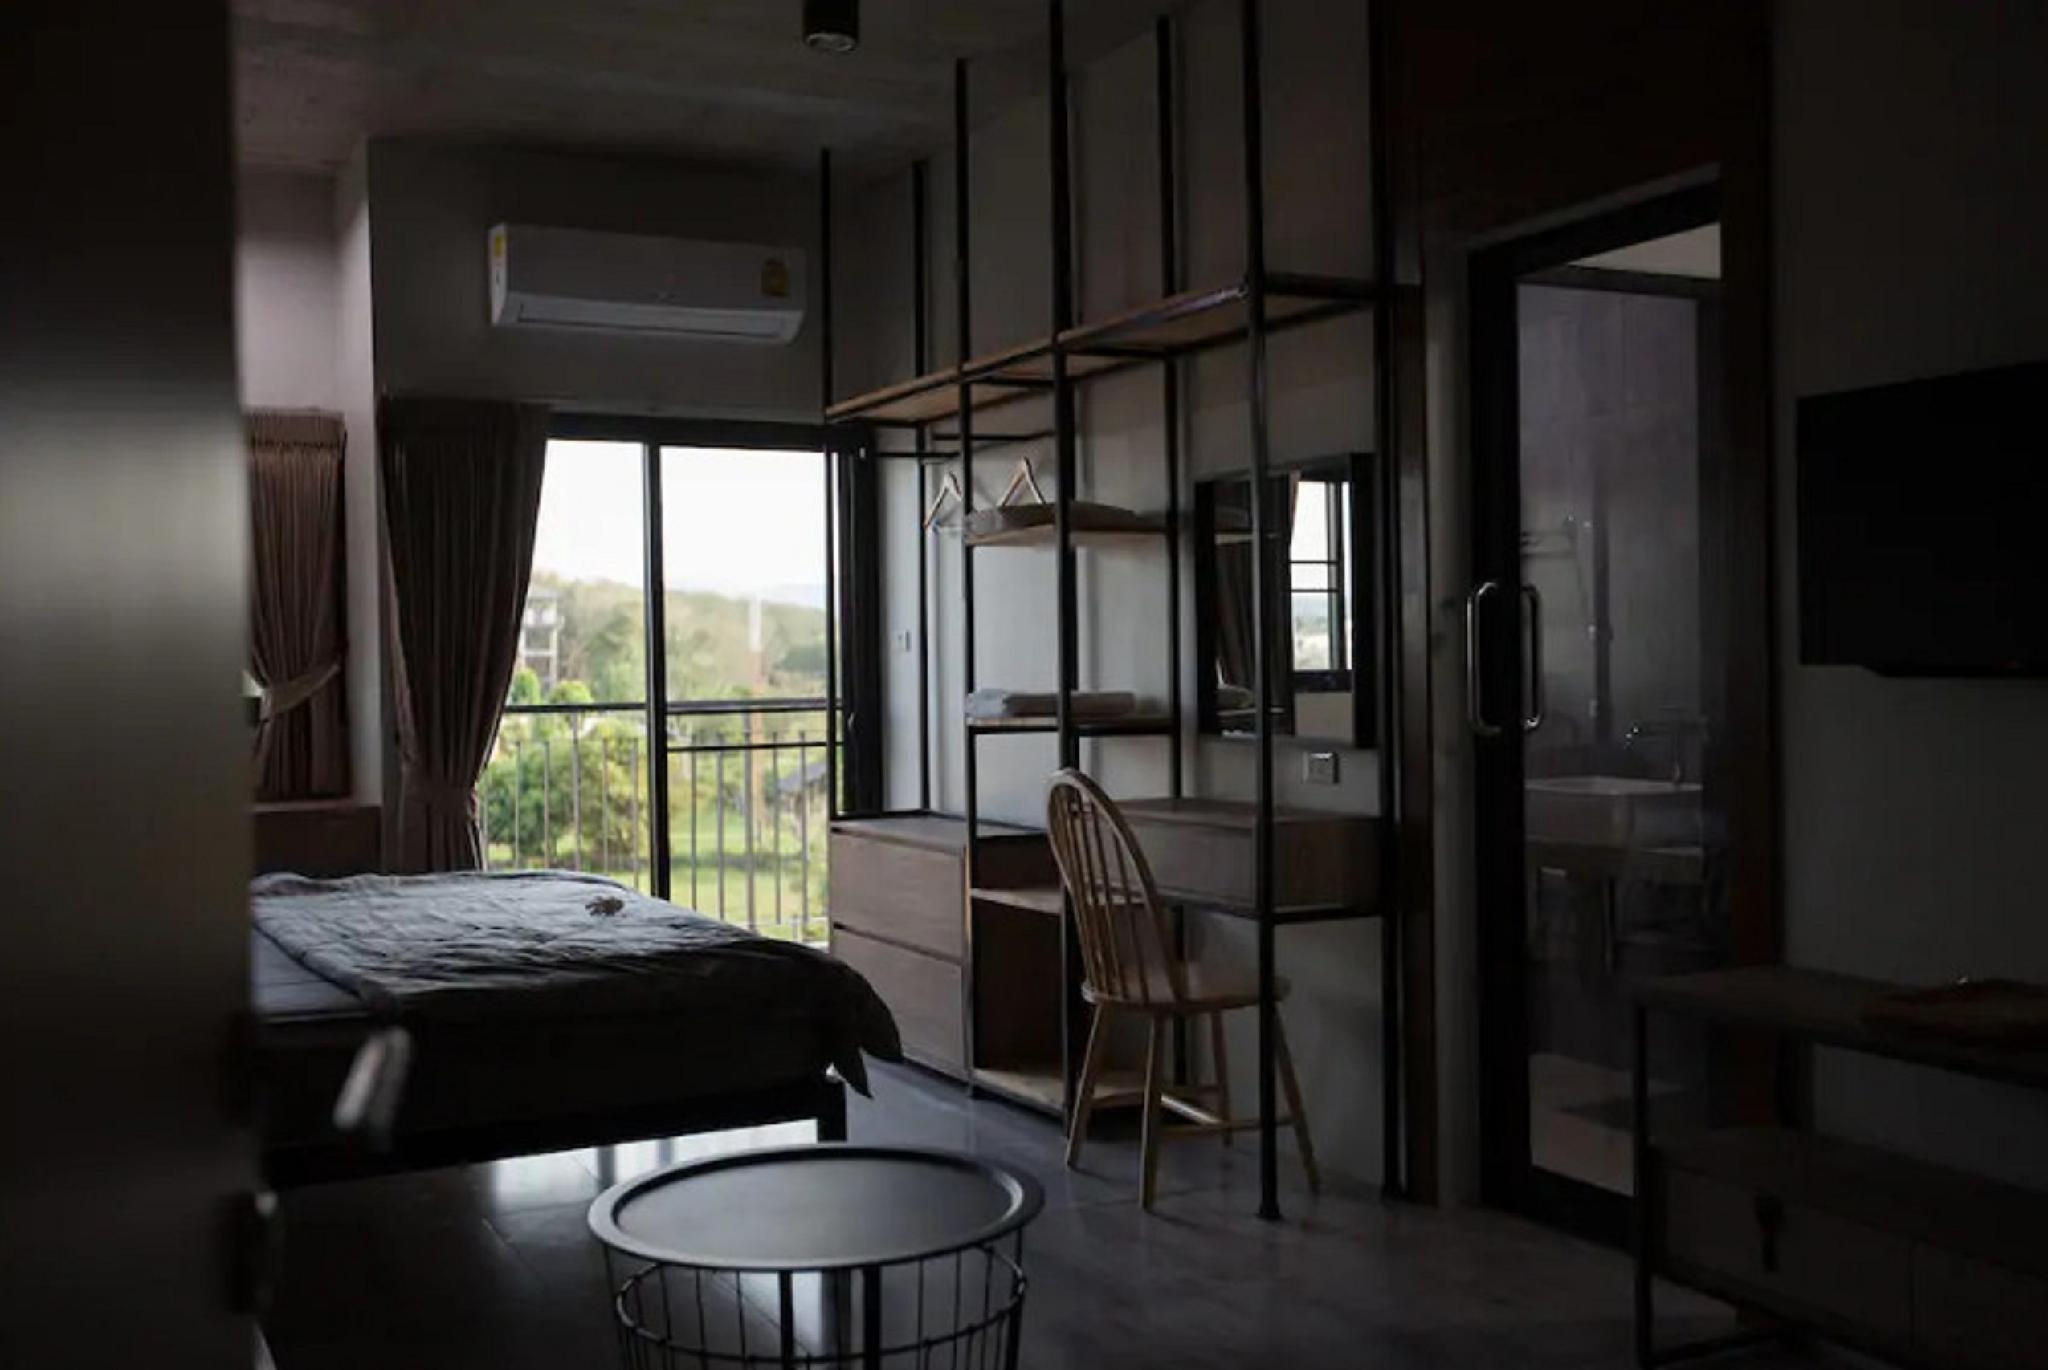 Be Live Residence - Modern loft room with kitchen 1 ห้องนอน 1 ห้องน้ำส่วนตัว ขนาด 35 ตร.ม. – อำเภอถลาง